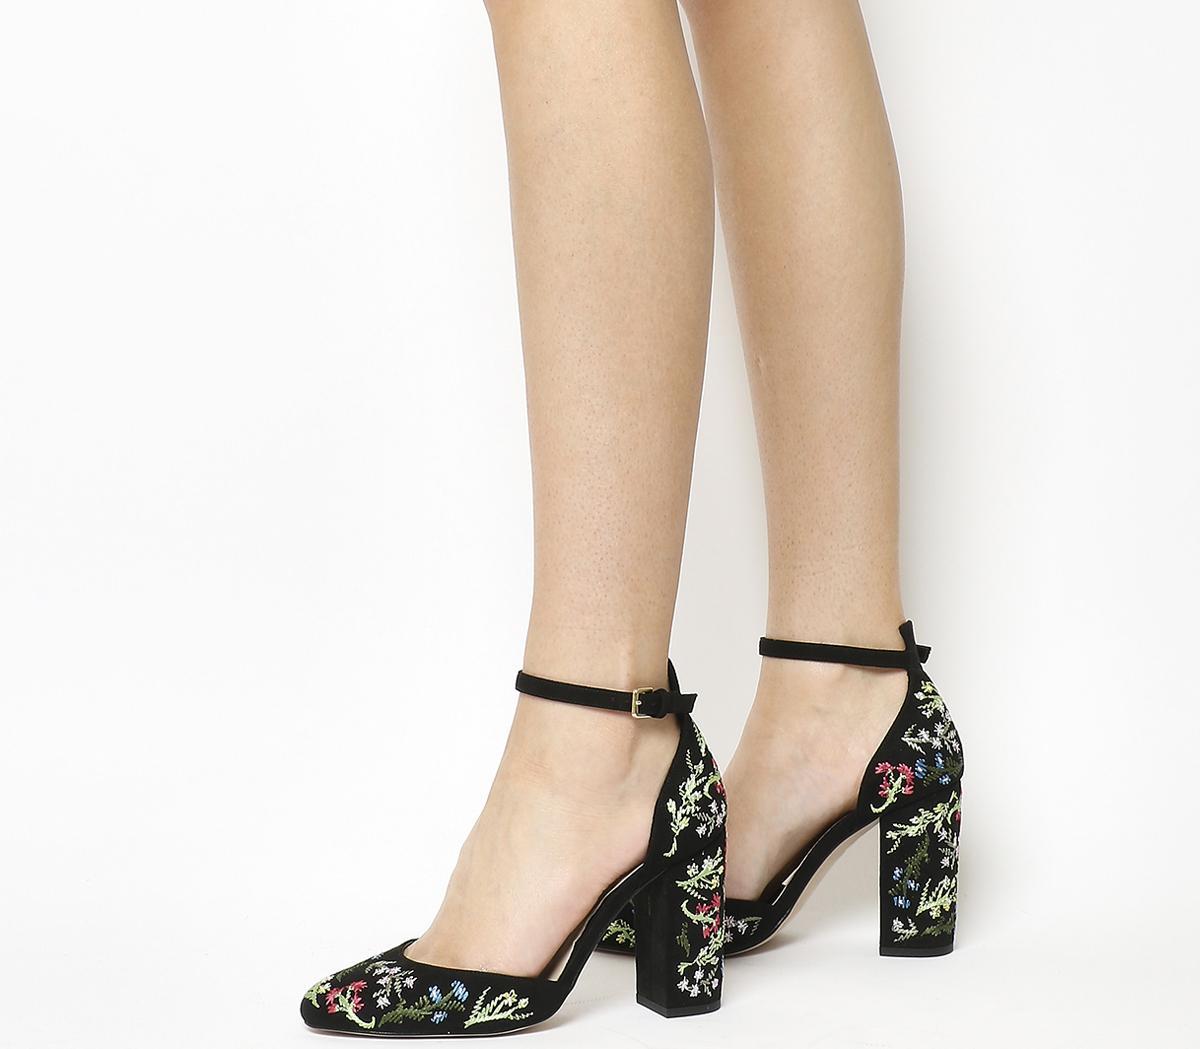 Hyacinth Mary Jane Heels